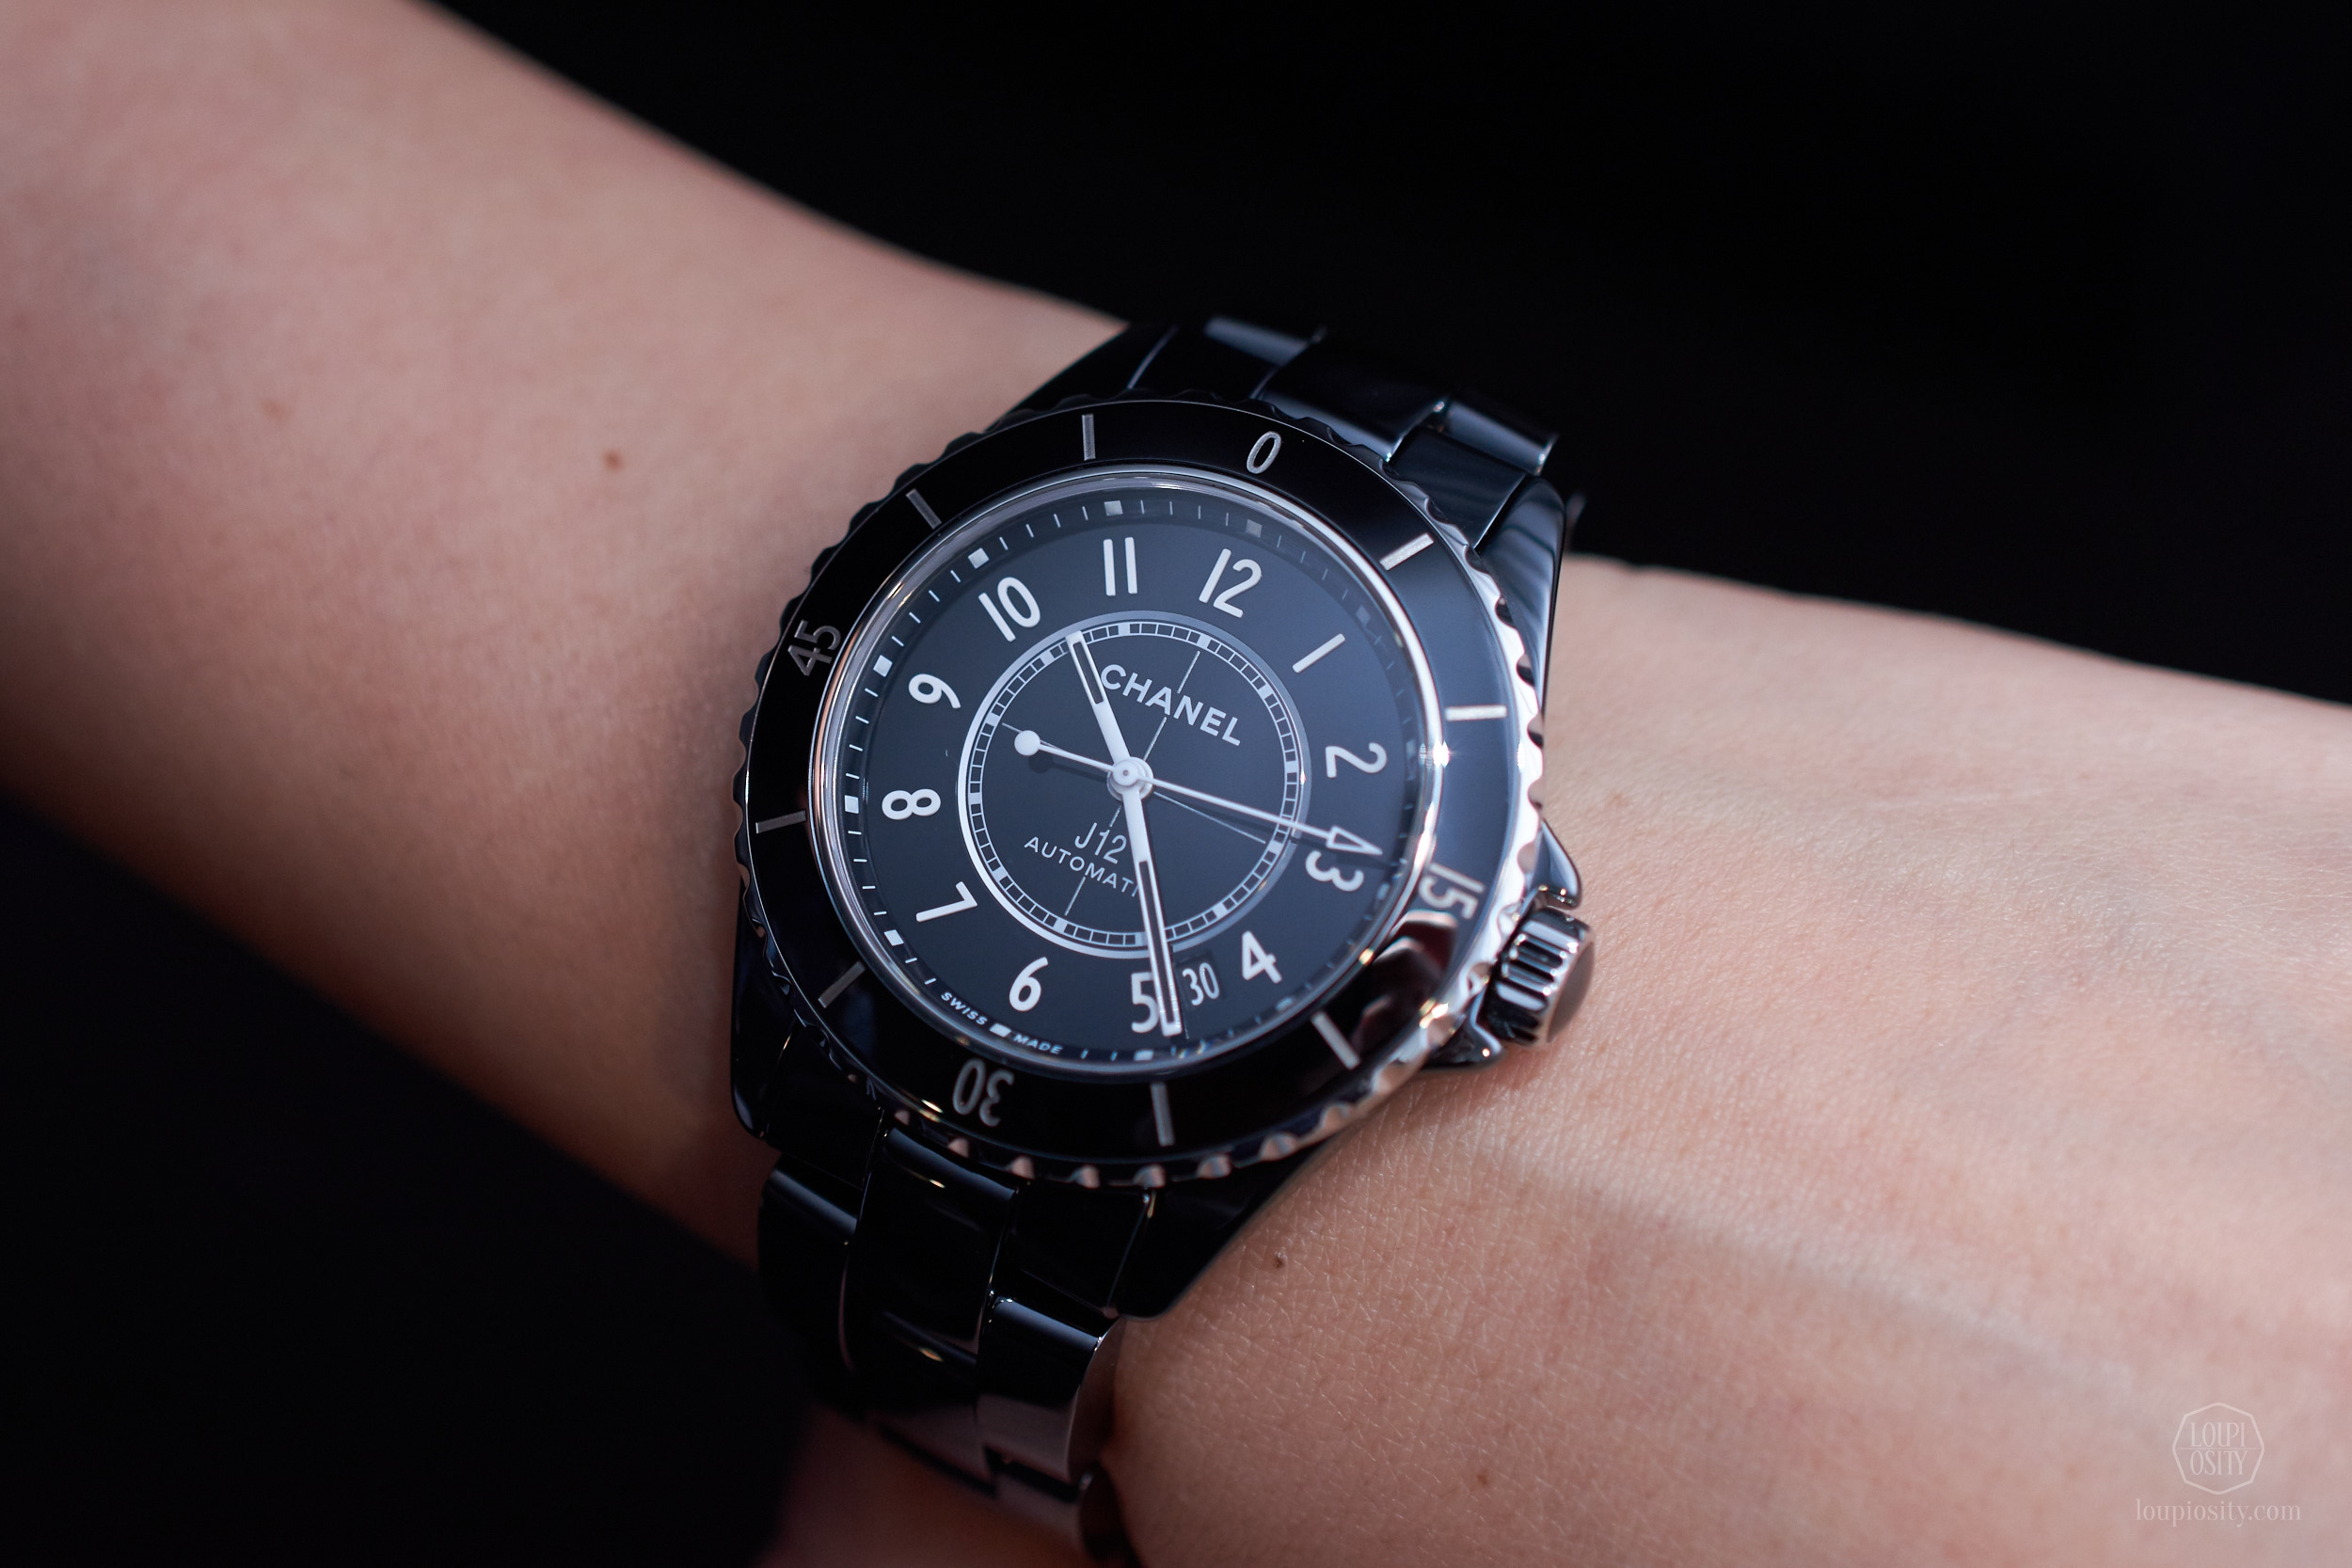 Chanel - J12 black